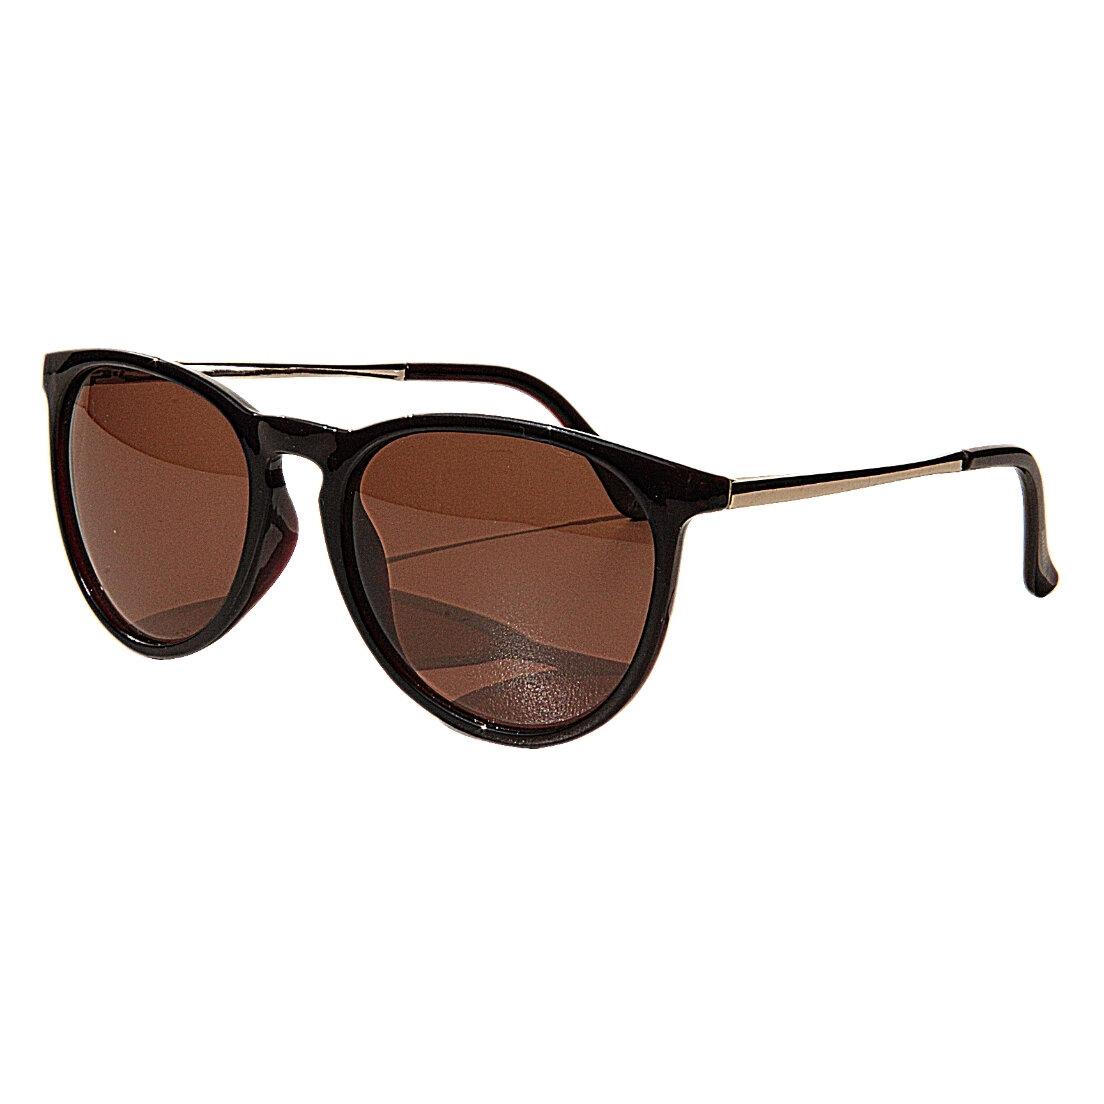 Óculos de Sol Khatto Round Erika Charmmy - C125